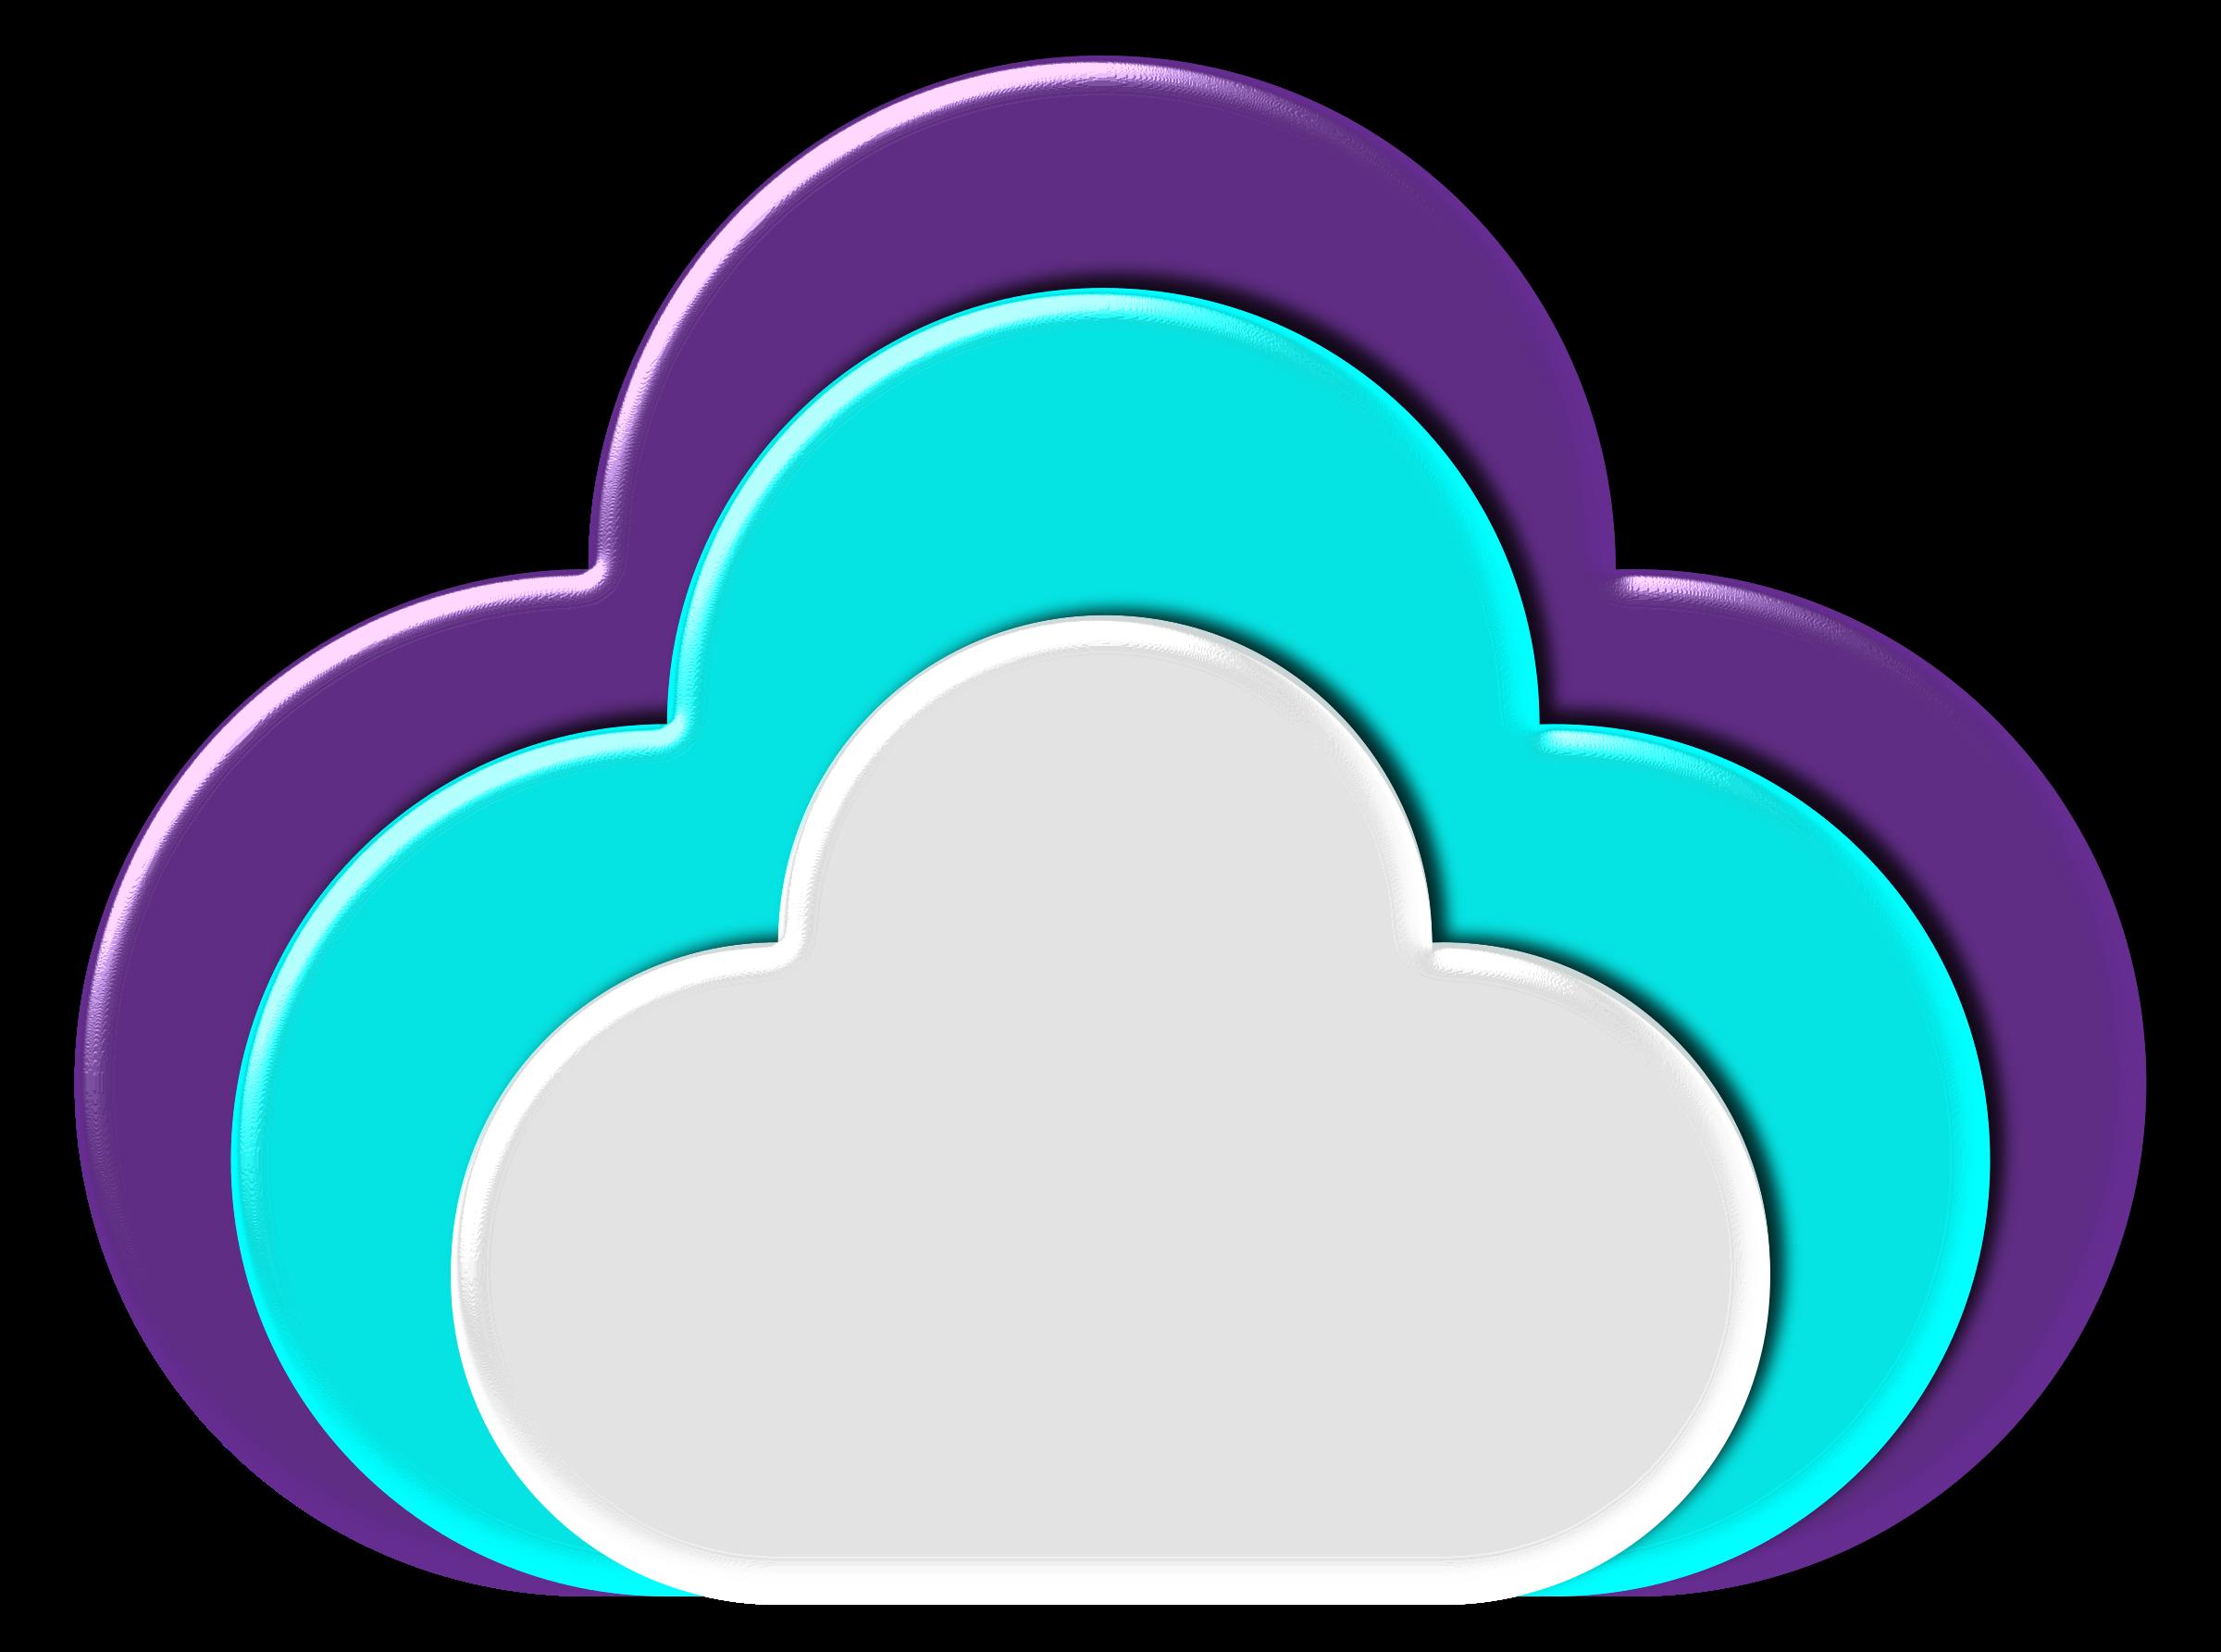 Communication clipart cloud. Icon big image png